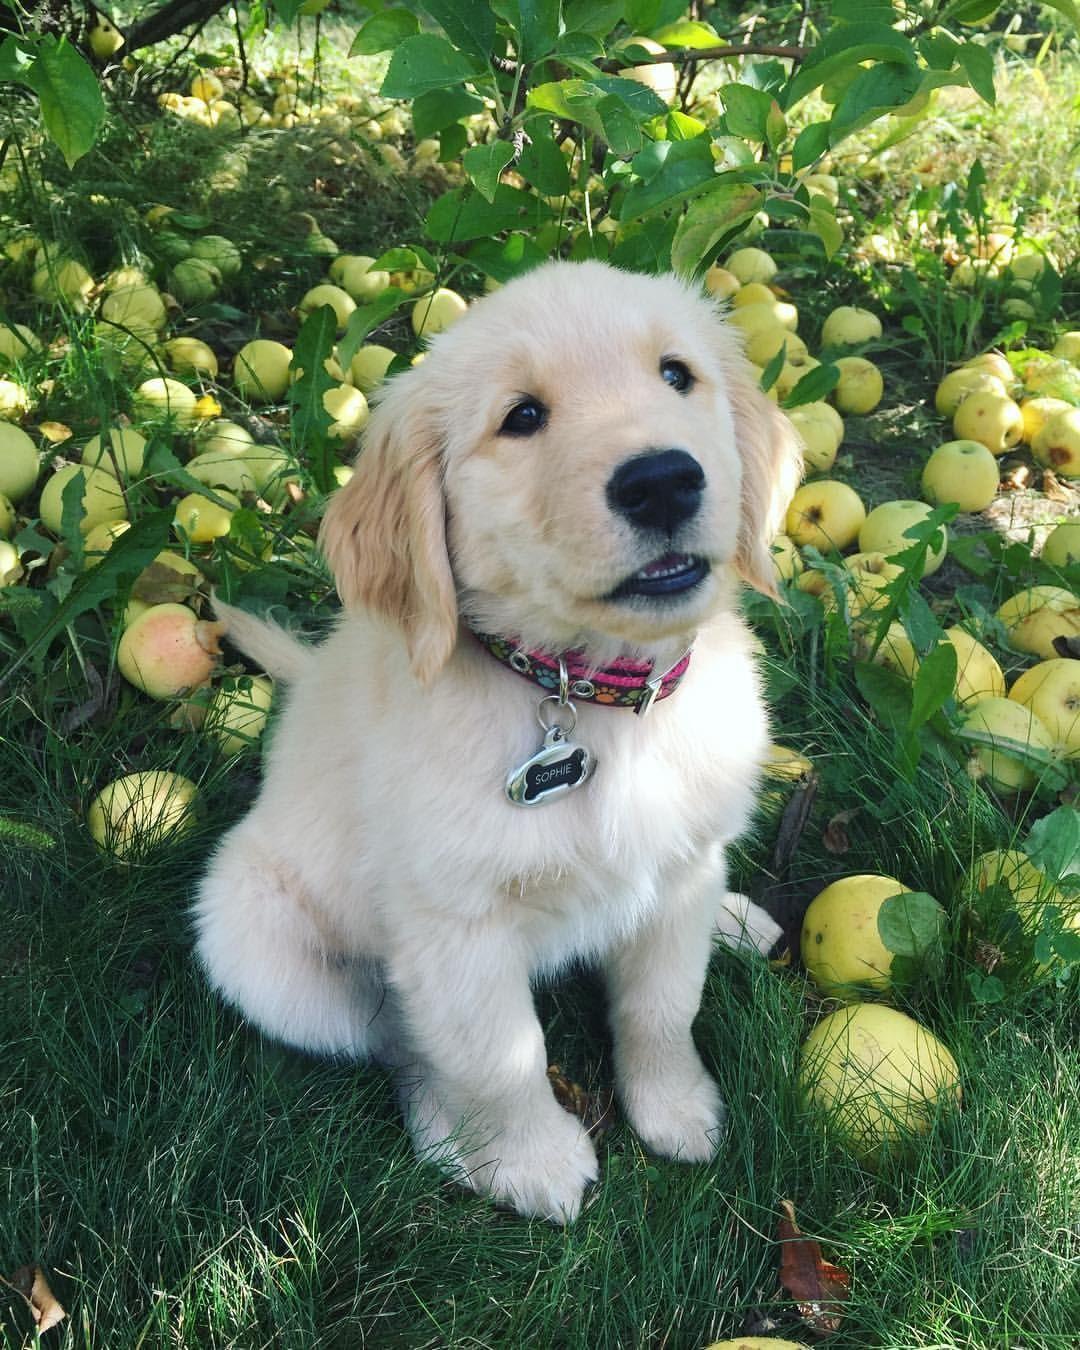 Cute Sophie The Golden Retriever Puppy 3 3 3 3 Cute Dogs Dogs Golden Retriever Cute Puppies